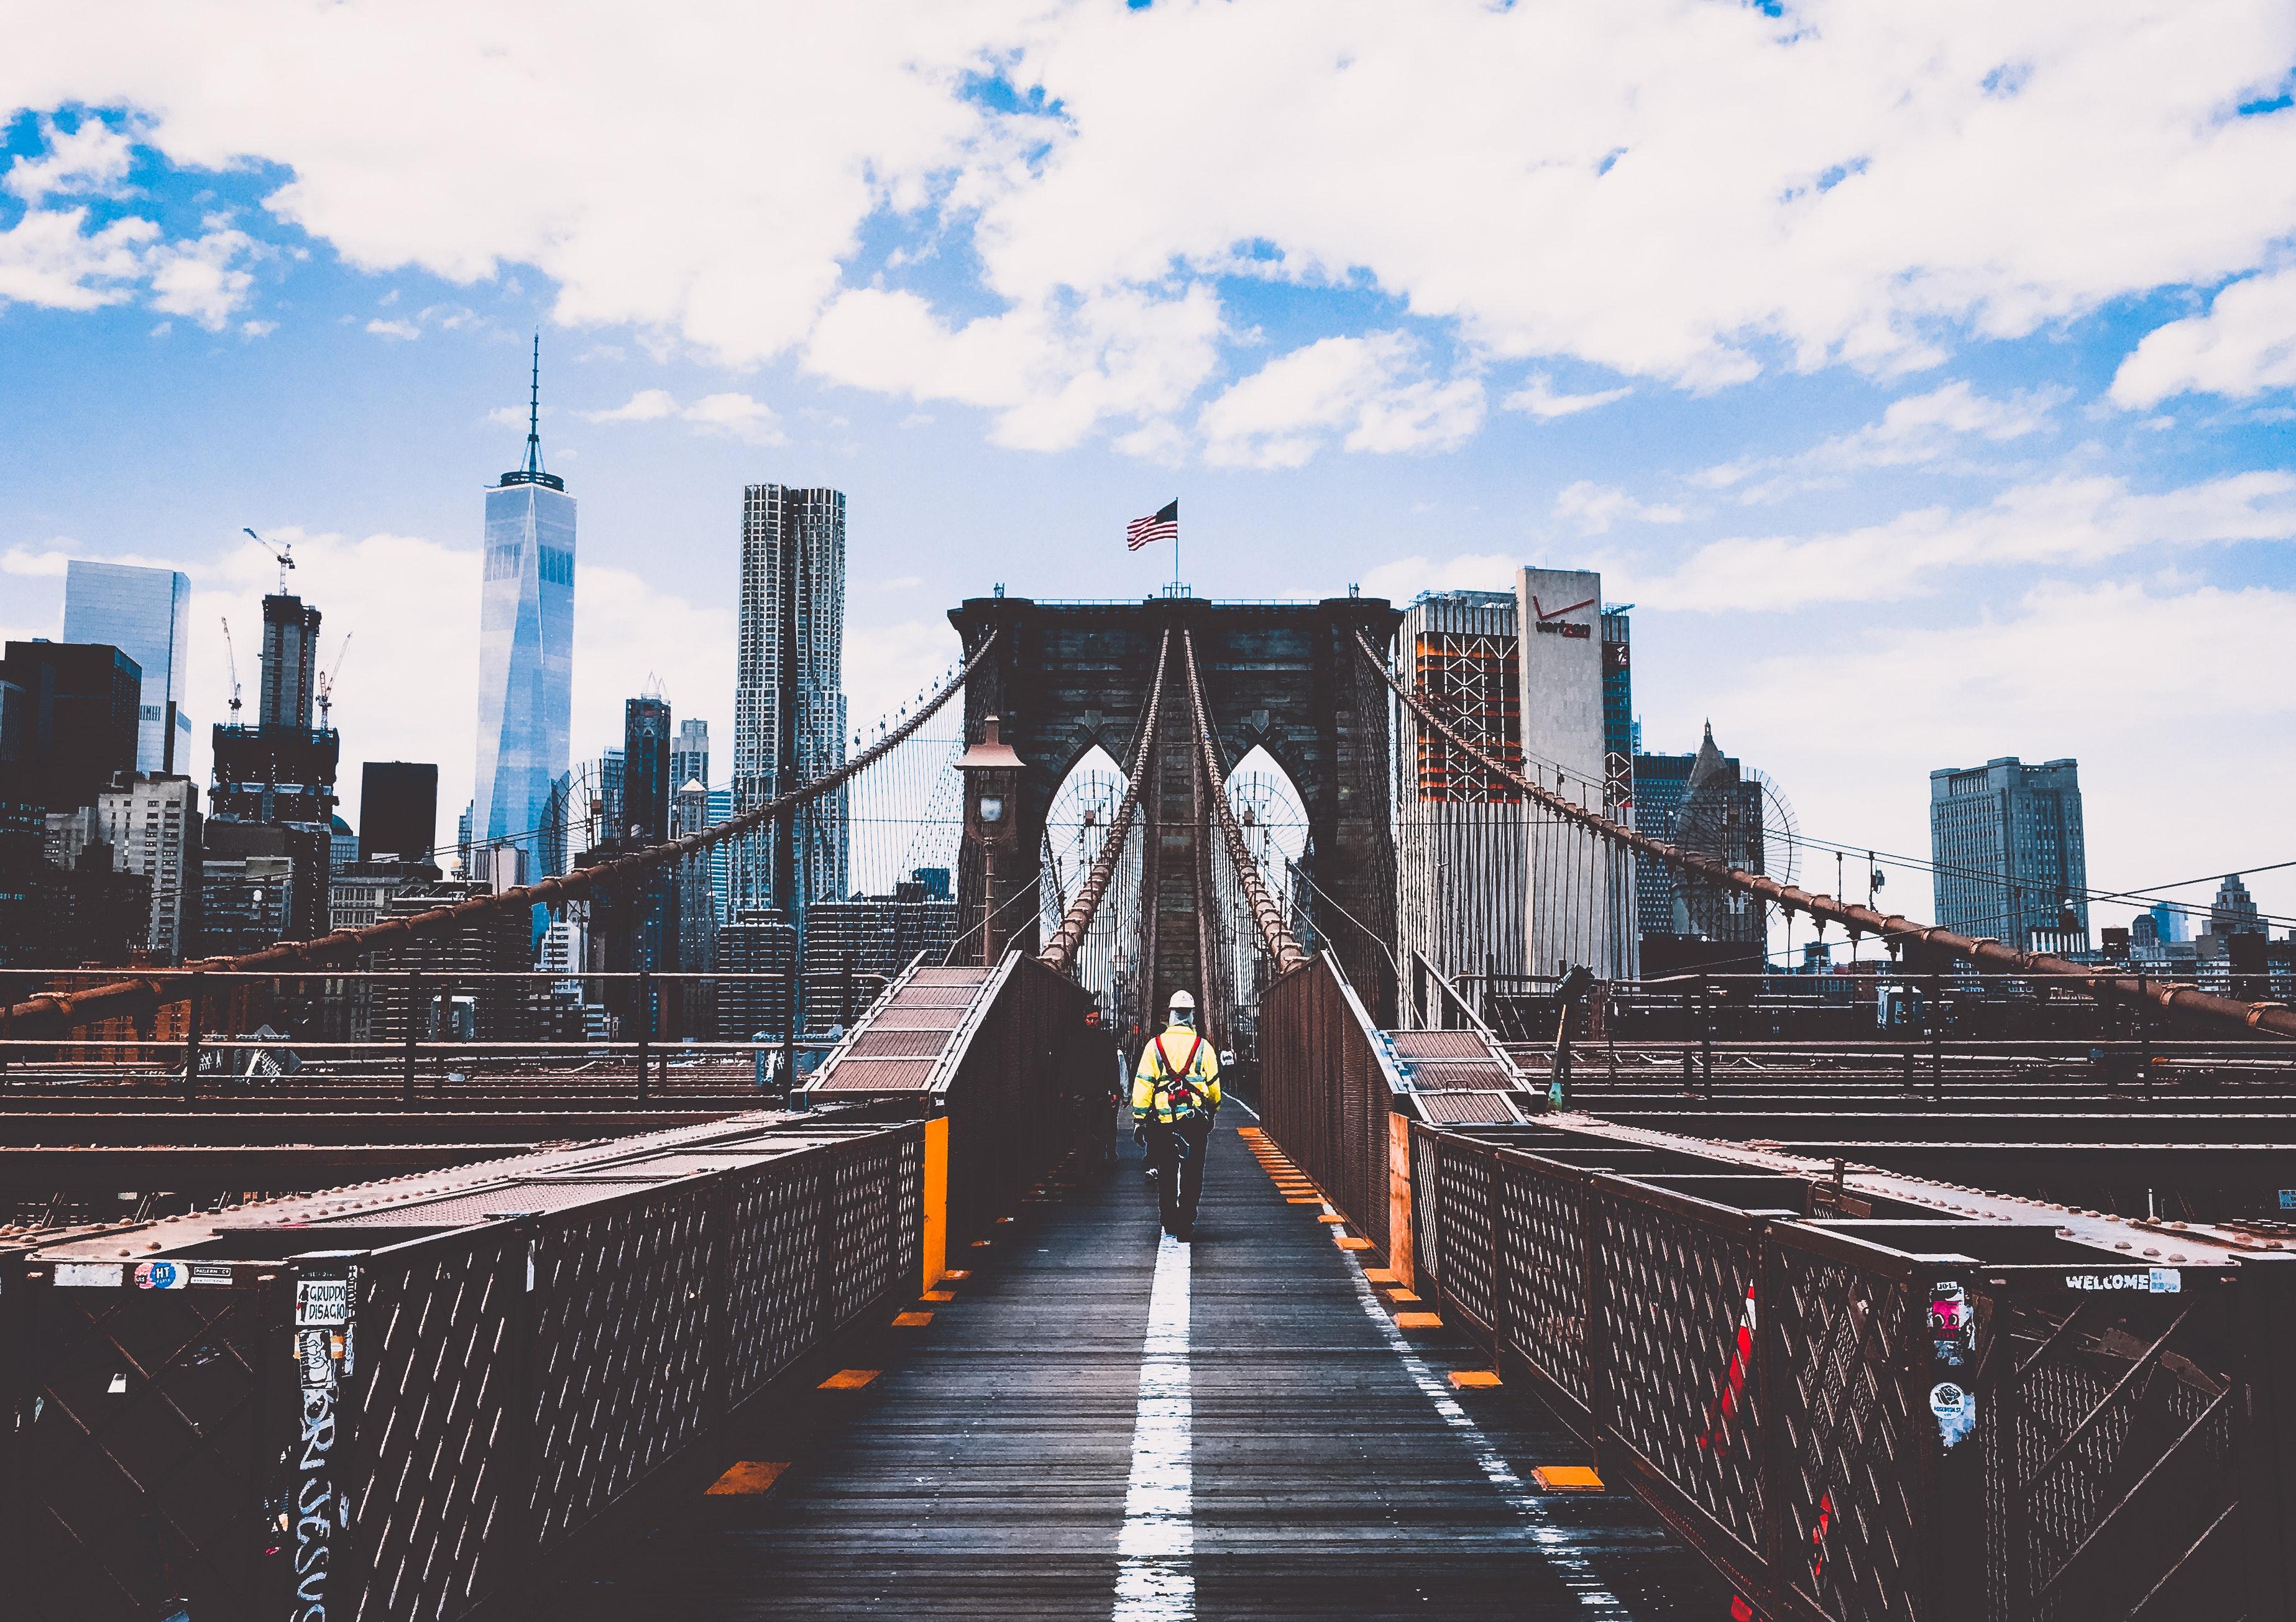 Free stock photos of new york · Pexels